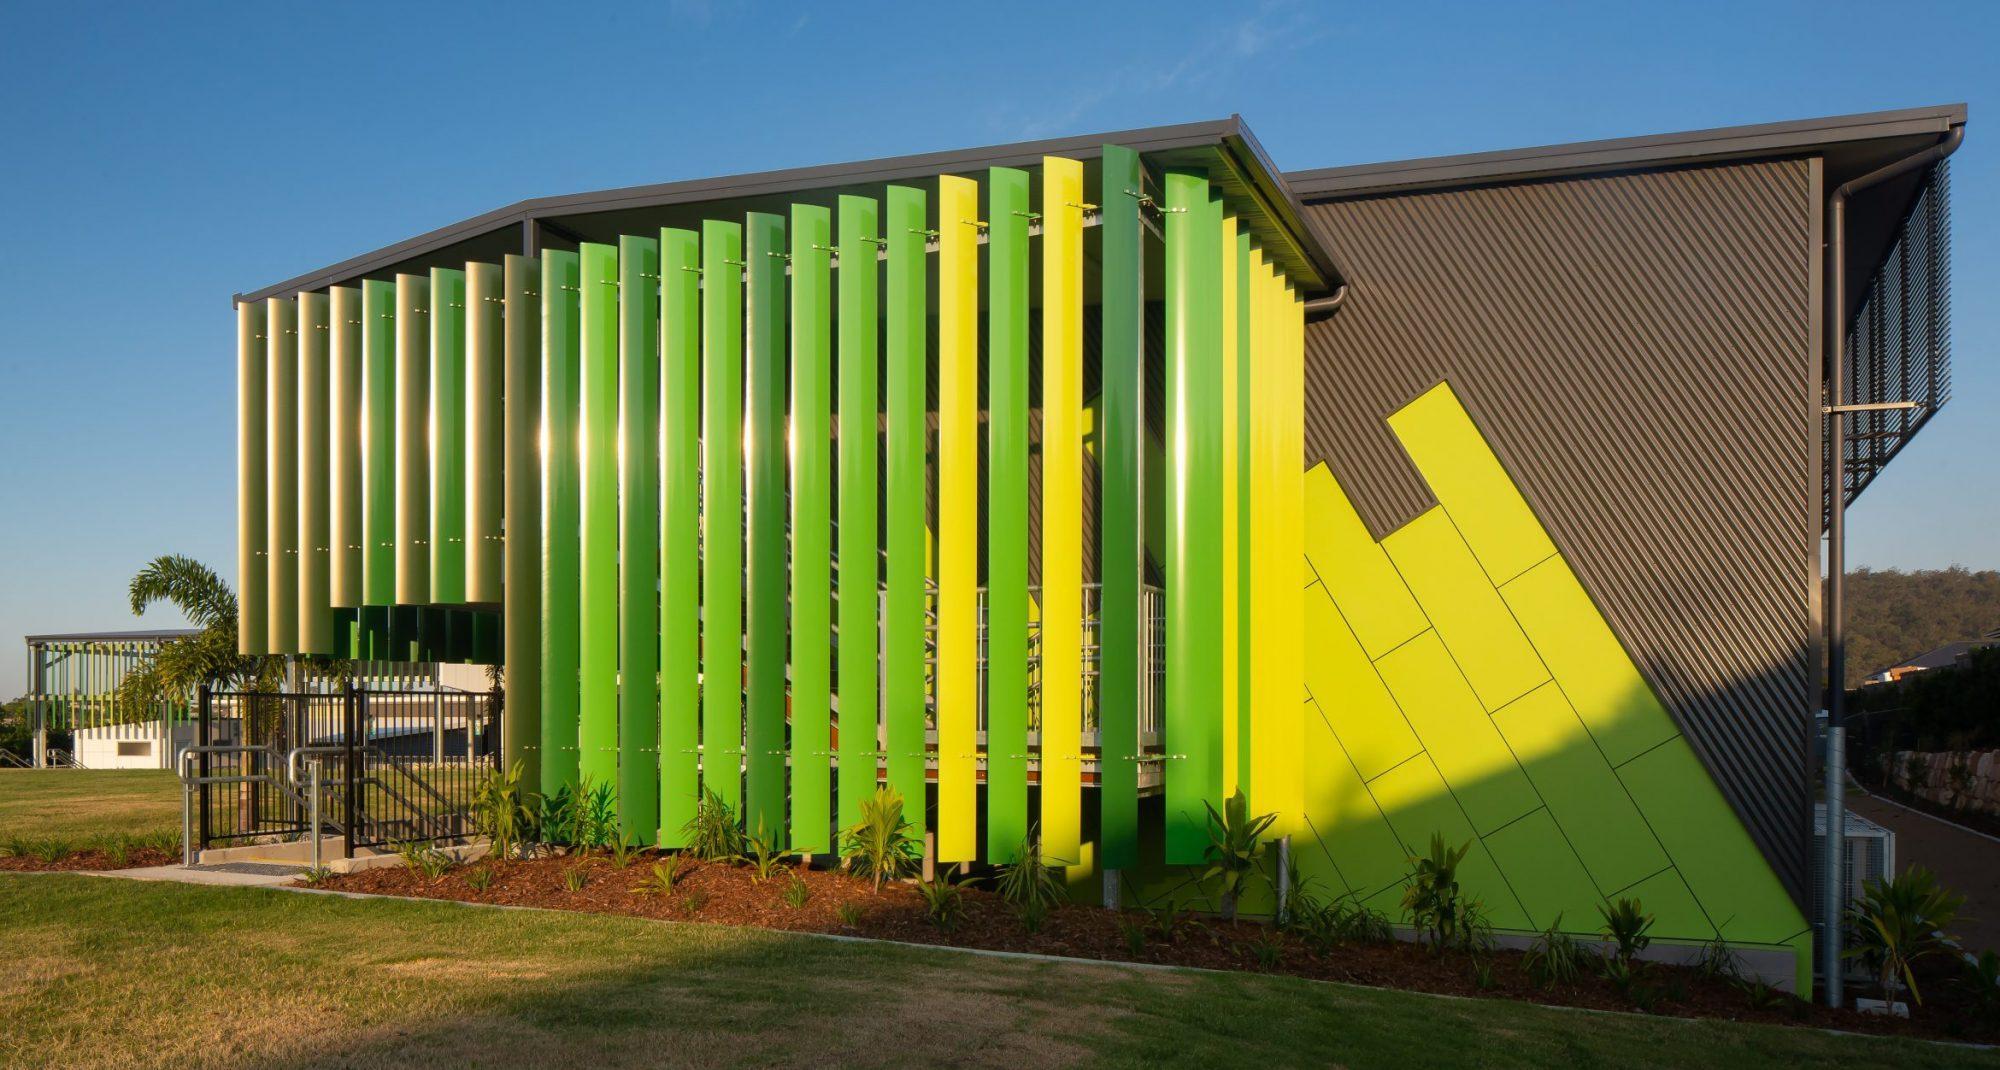 Heise Architecture